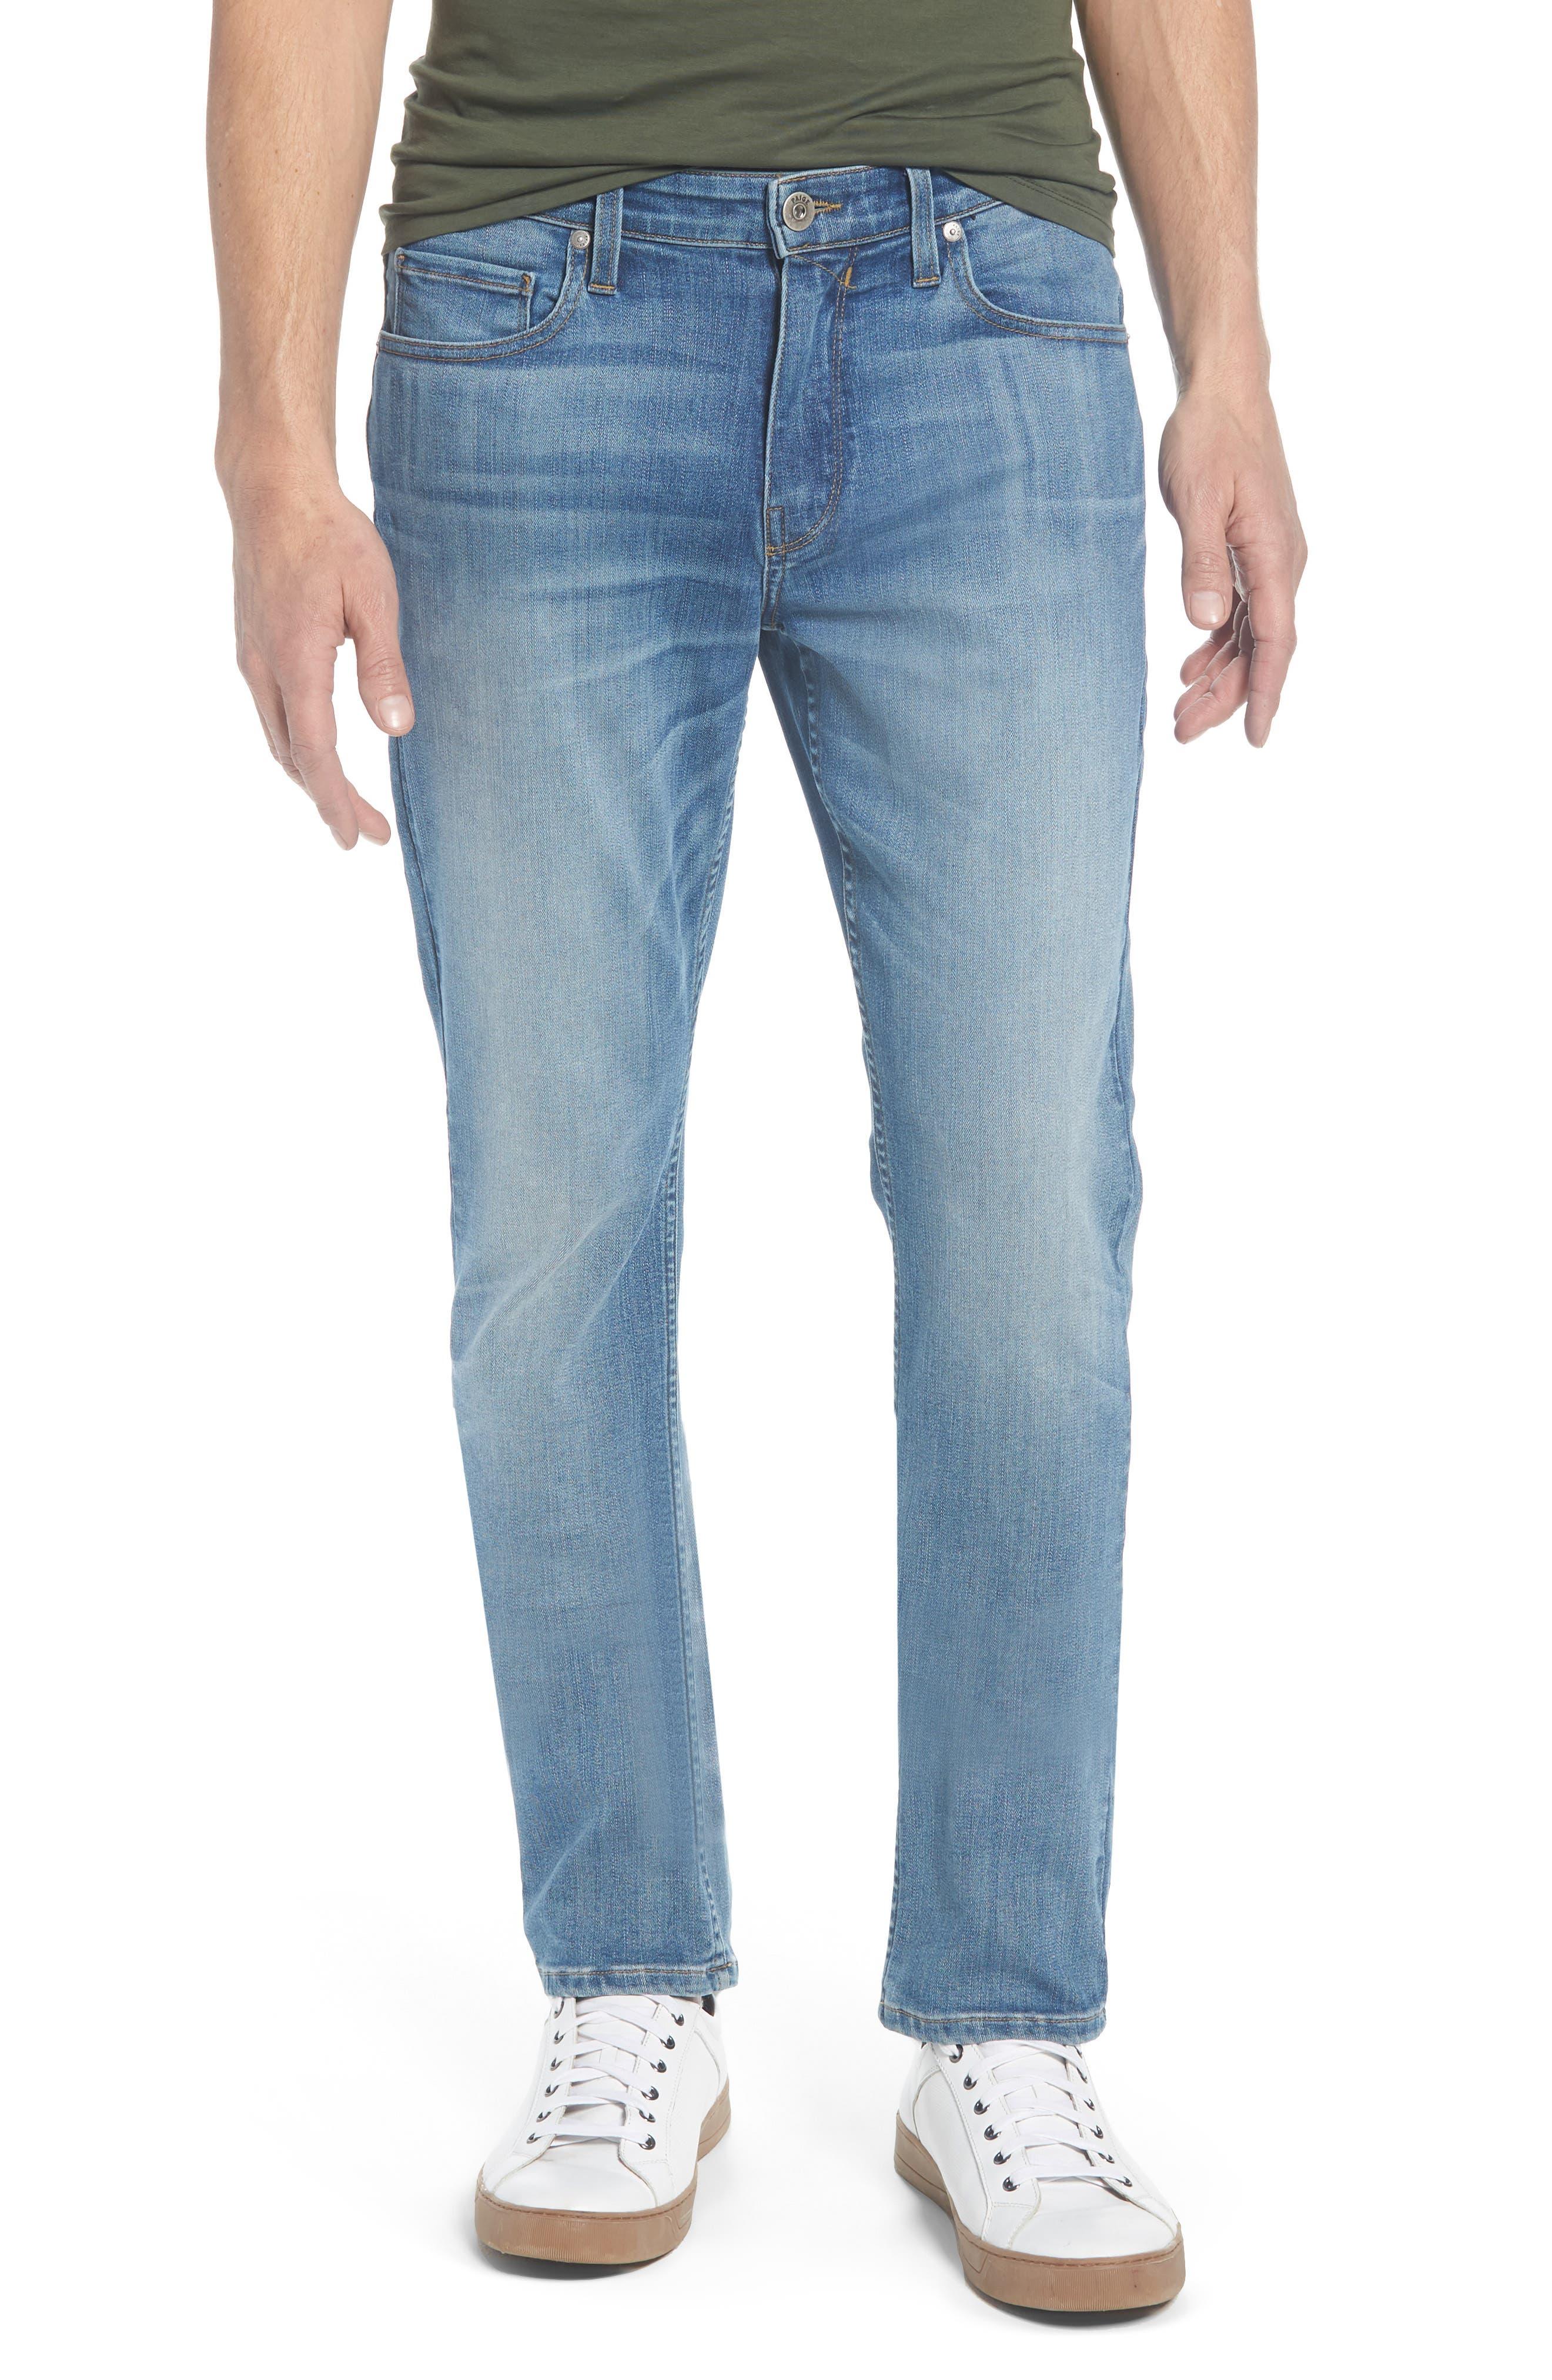 Transcend - Lennox Slim Fit Jeans,                             Main thumbnail 1, color,                             CARTWRIGHT